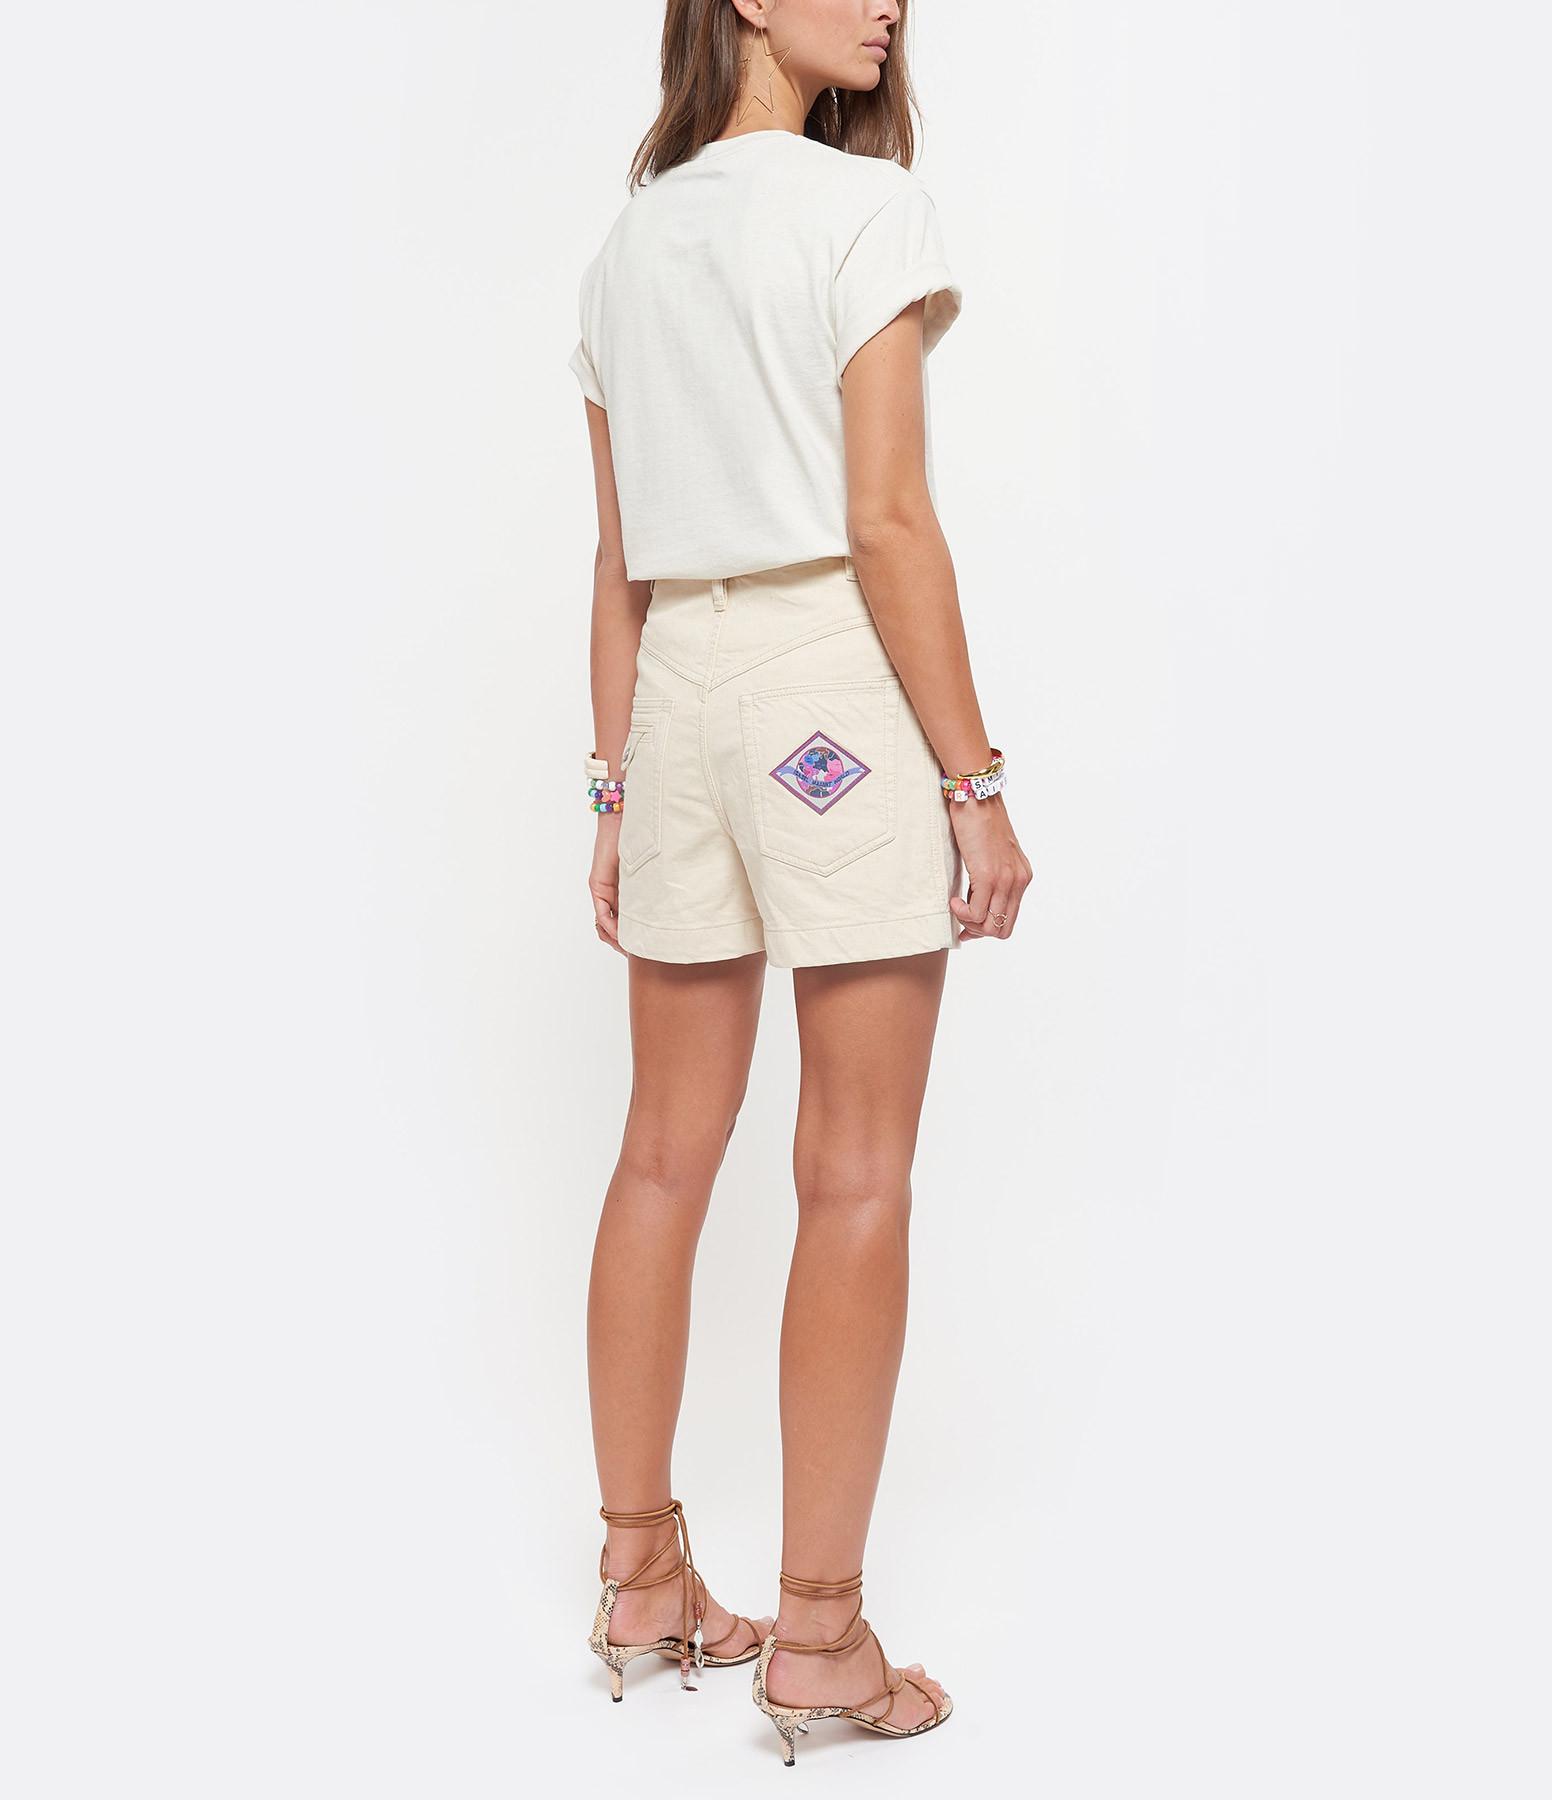 NEWTONE - Tee-shirt Phoenix Coton Naturel